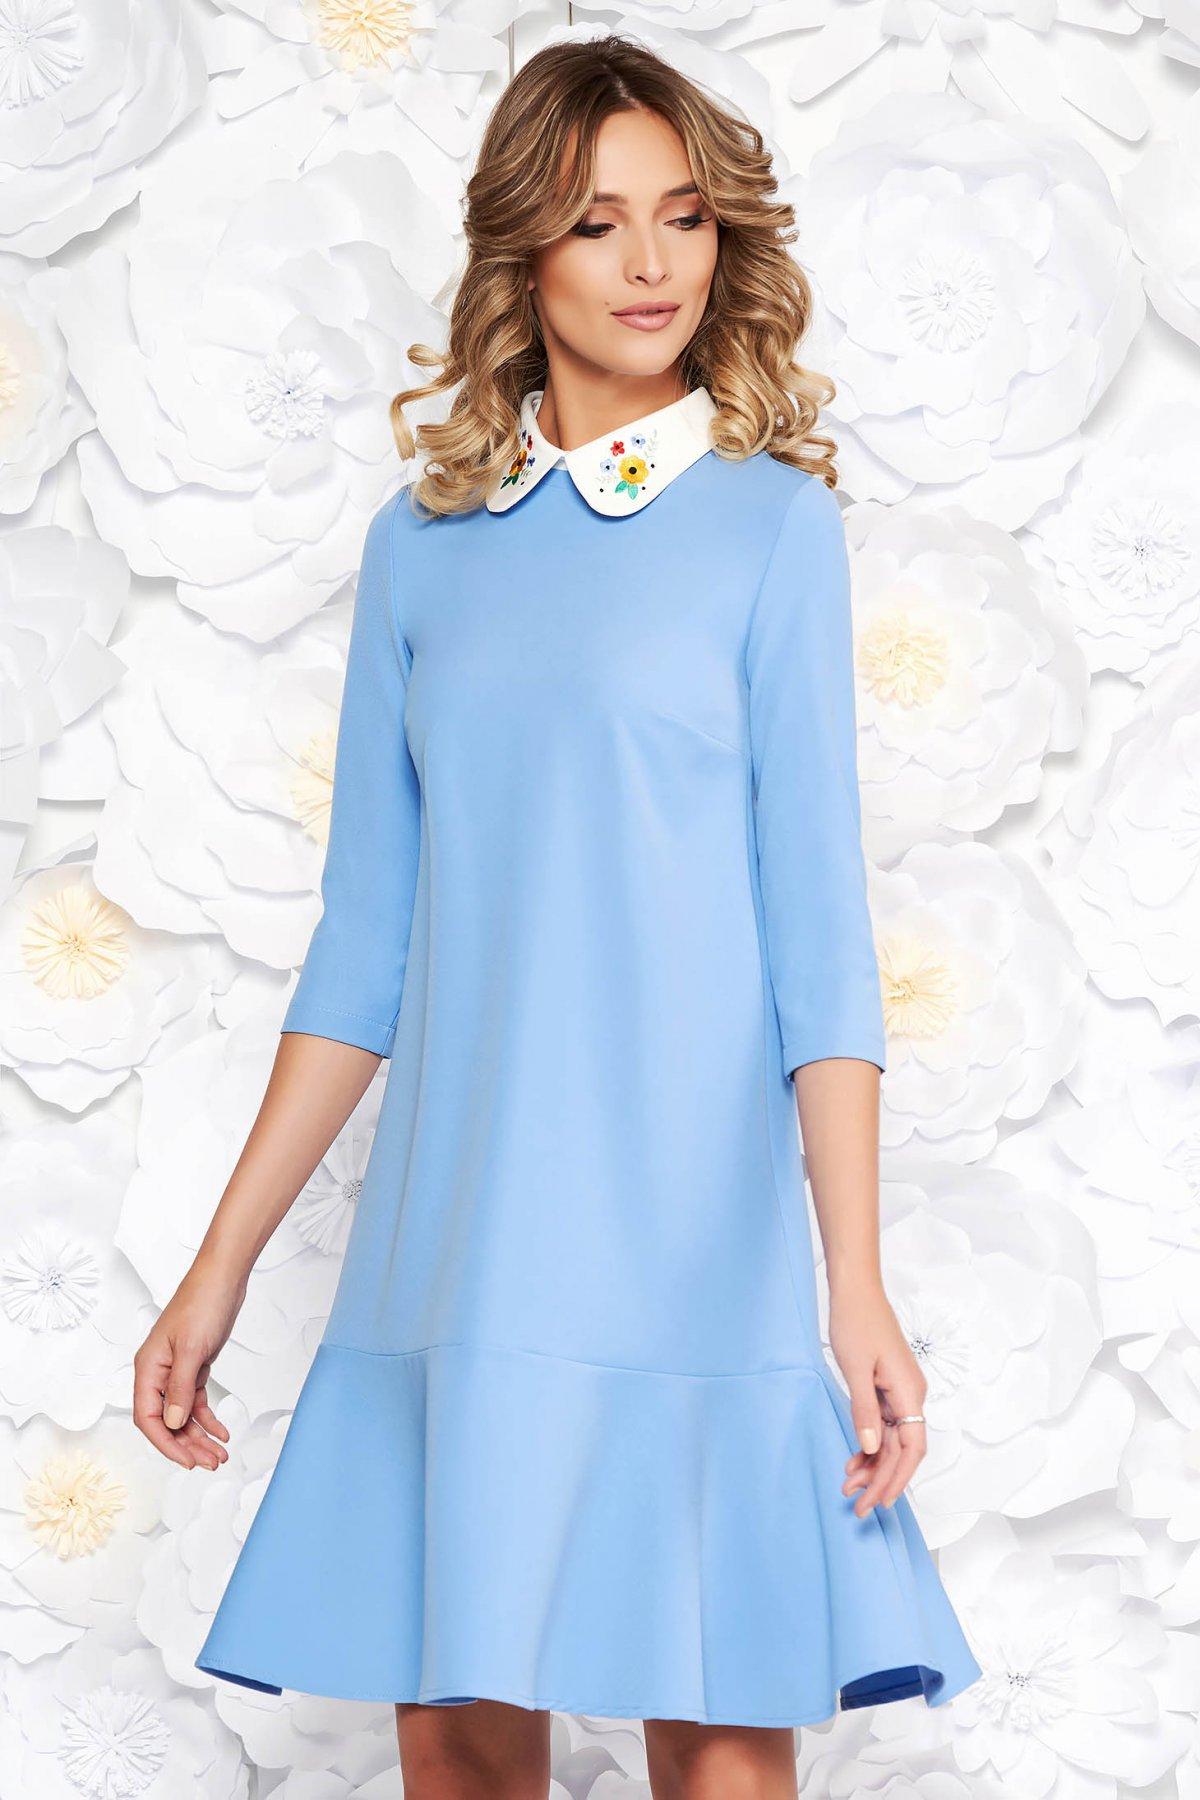 Rochie StarShinerS albastra eleganta cu croi larg din stofa usor elastica cu guler rotunjit brodat